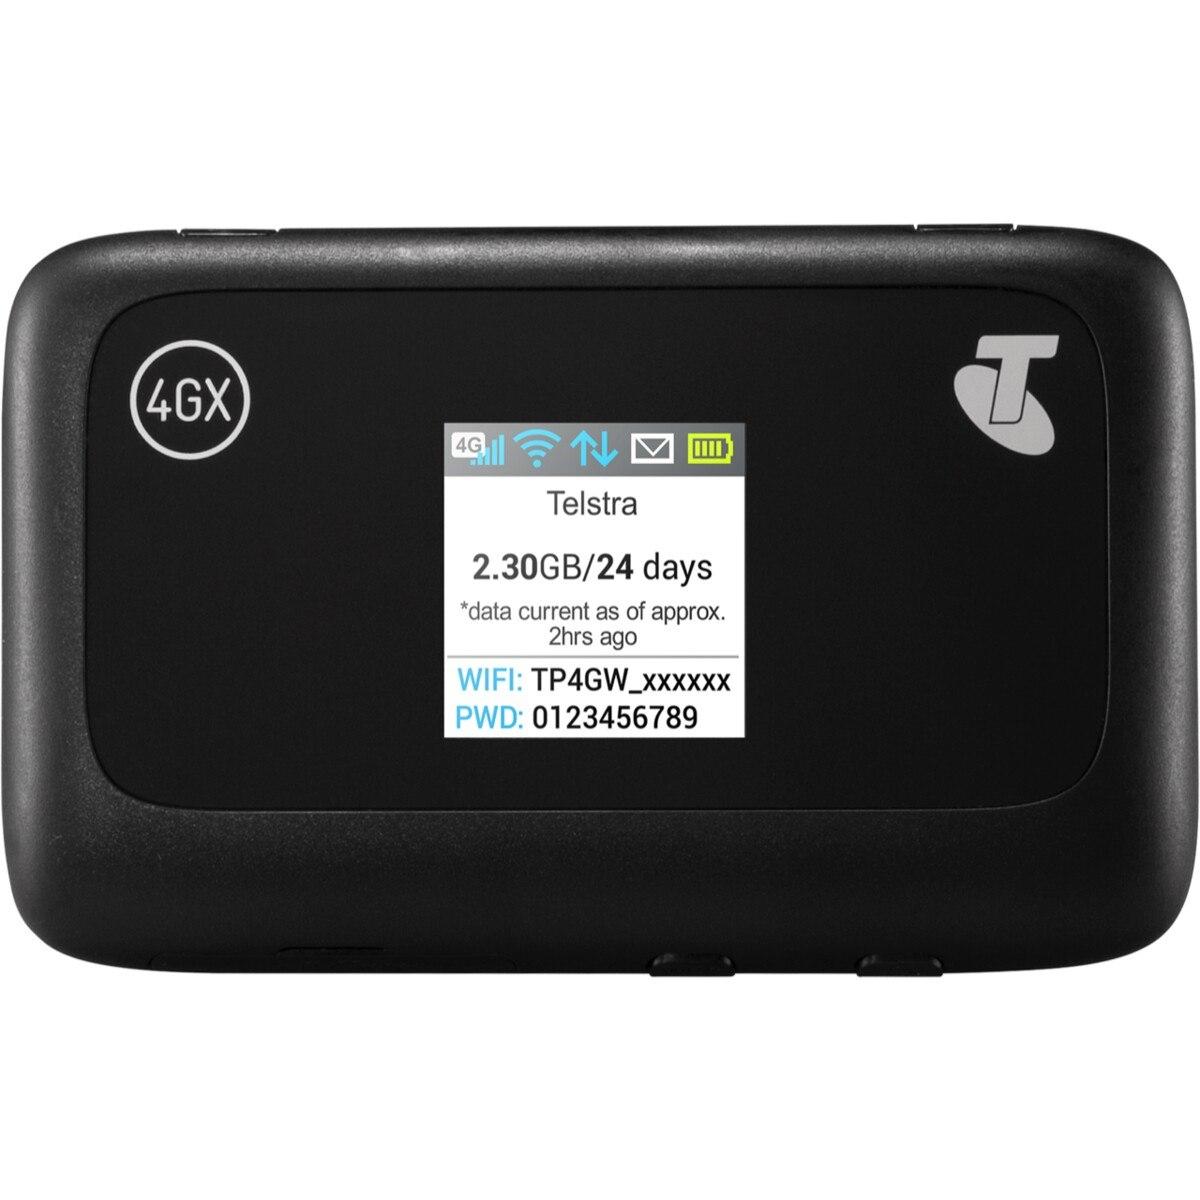 Telstra 4GX Wi-Fi Plus (MF910Y) (Outright/Locked To Telstra)